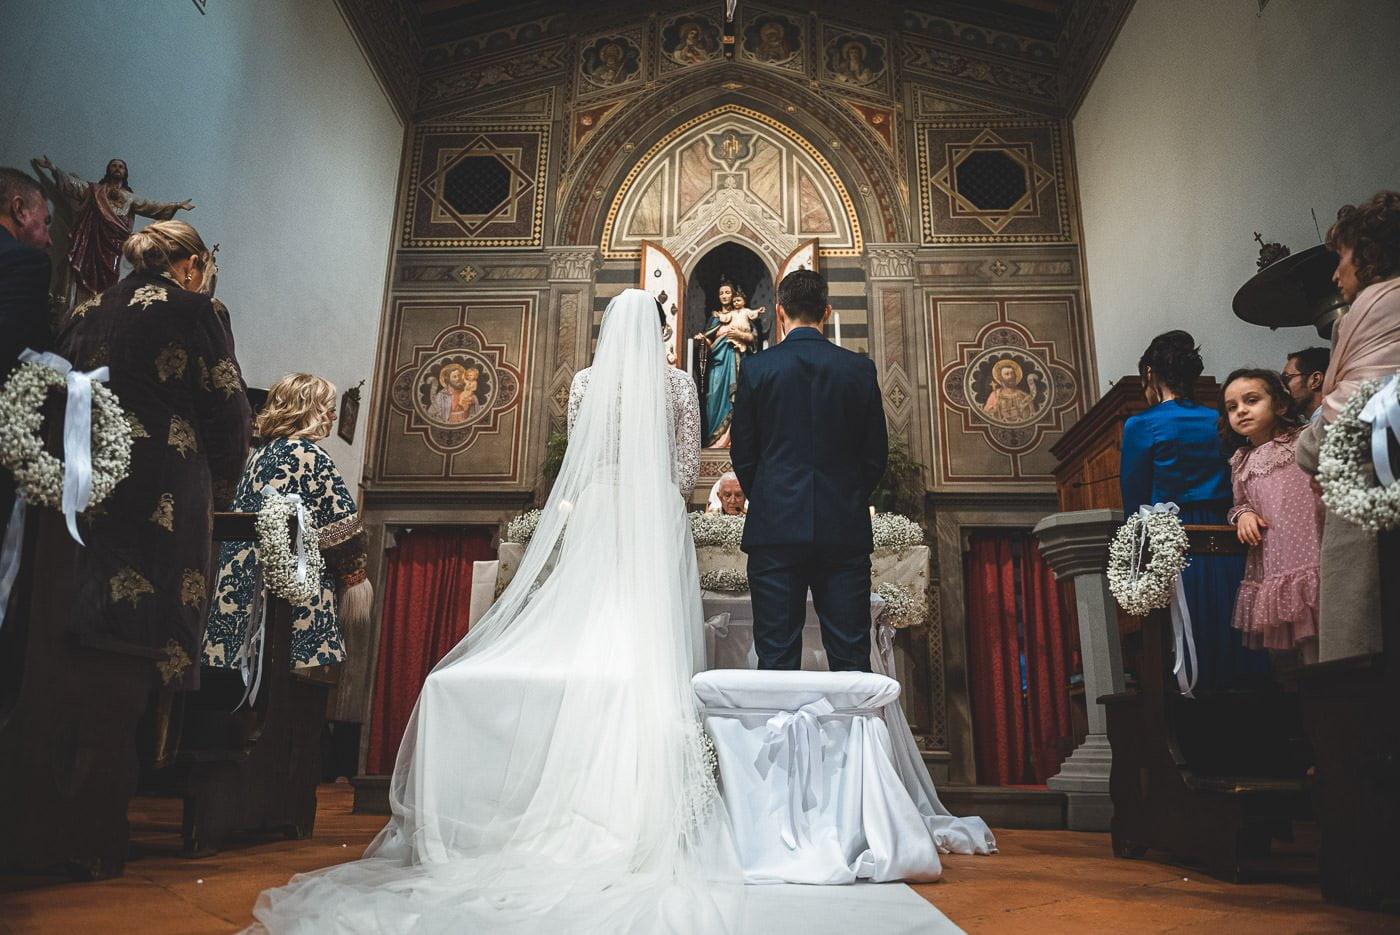 Matrimonio Giulia & Alessandro 28_12 – Alessio Nobili Photographer-23